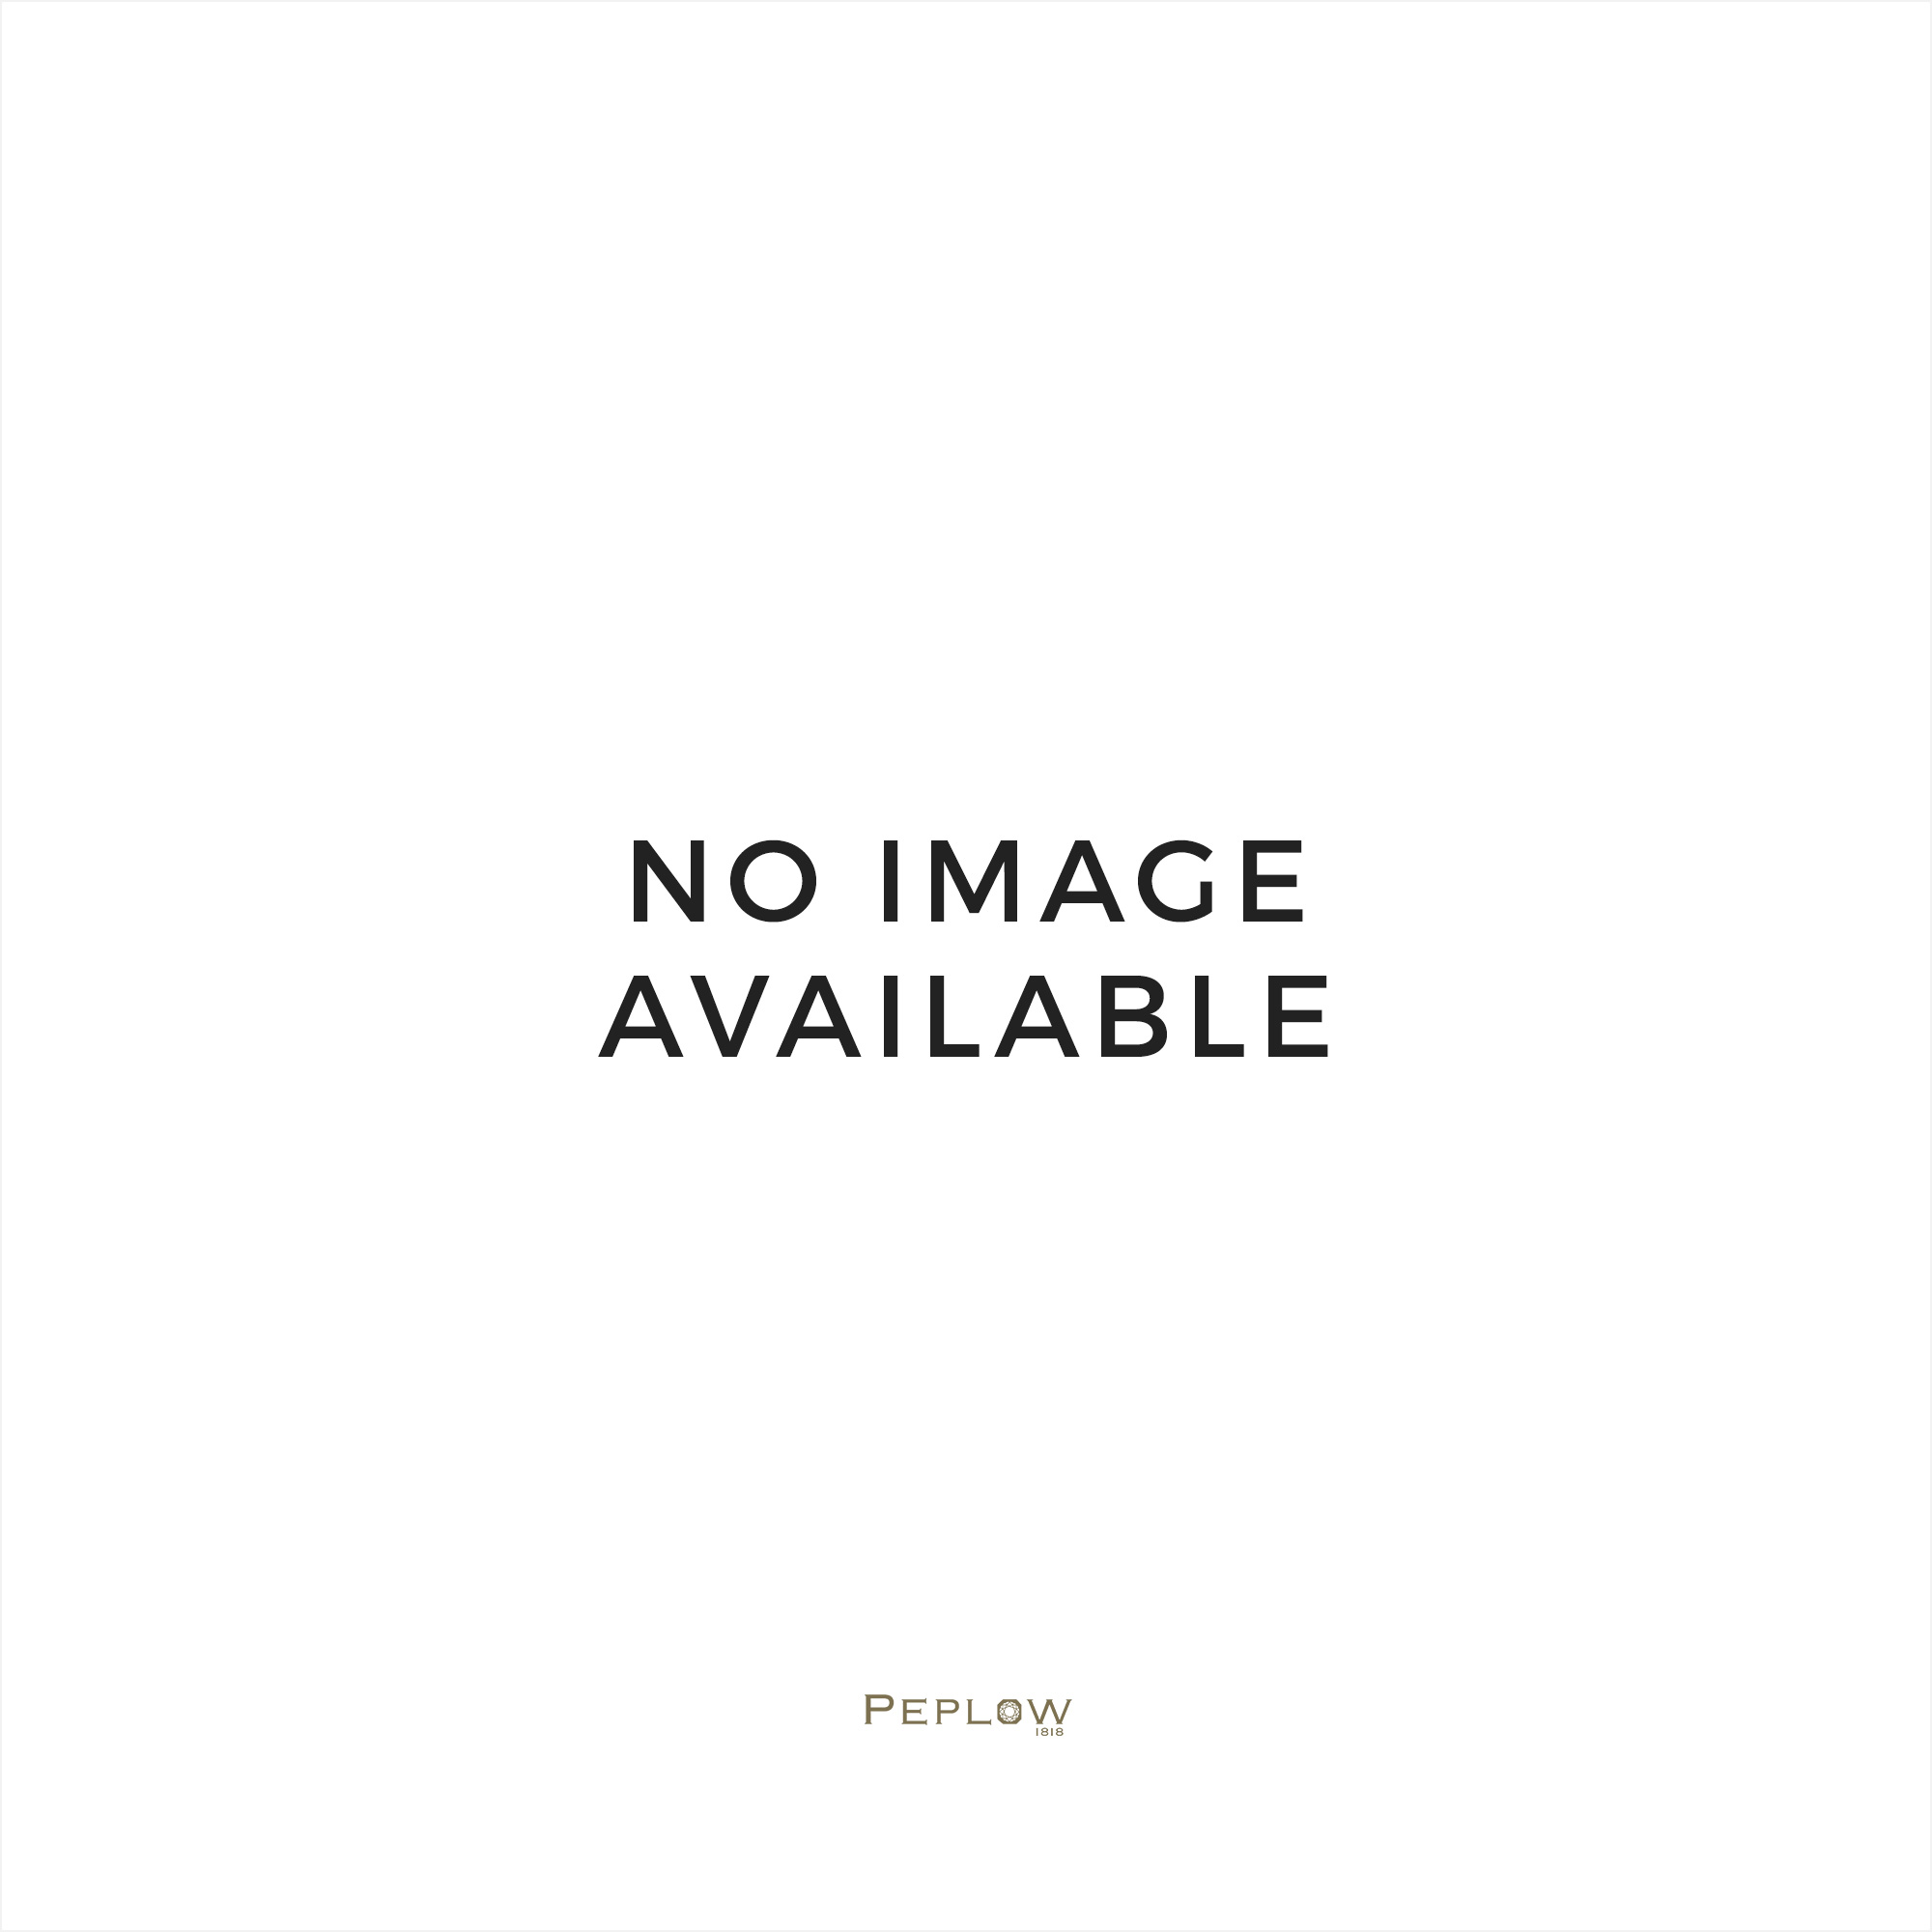 Montblanc Single Eraser